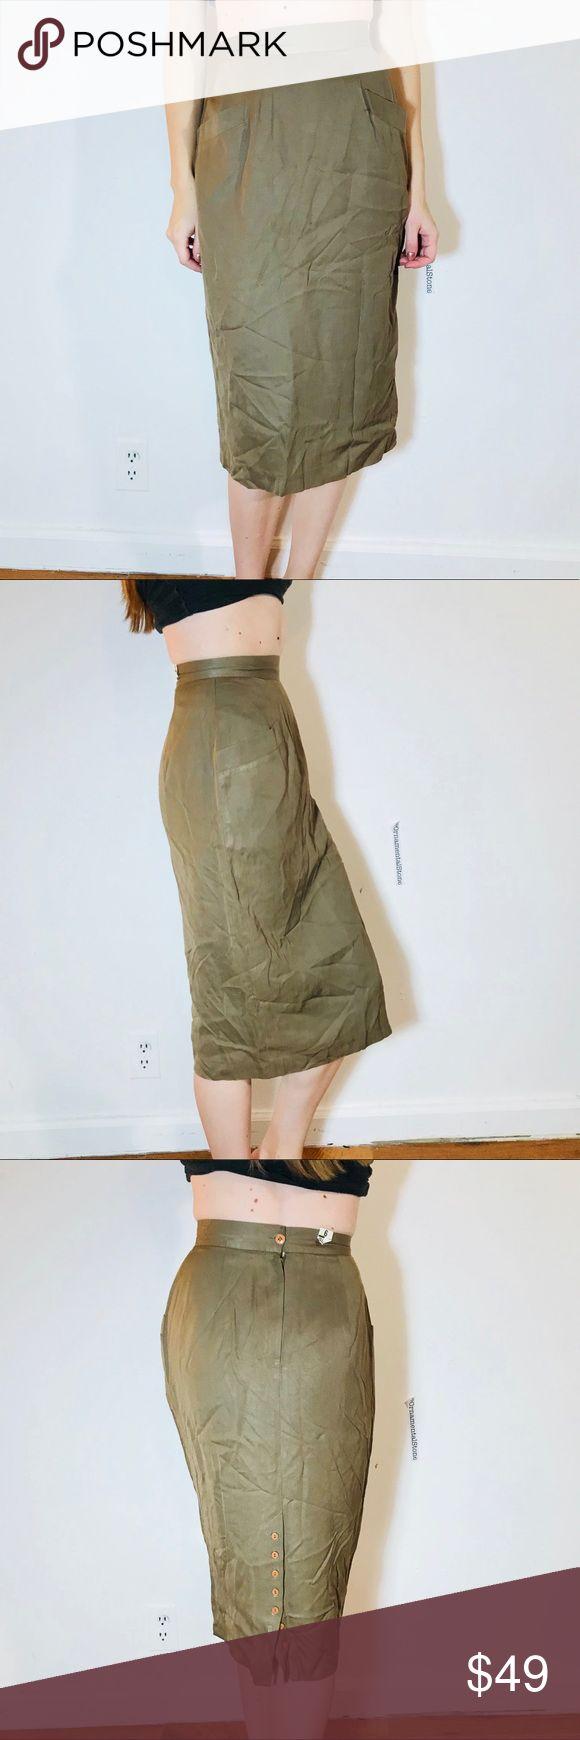 VINTAGE PIN UP STYLE BUTTON BACK SLIT SKIRT XXS EUC, minimal wear. Vintage size 6 - modern size XXS/0 Vintage Skirts Pencil